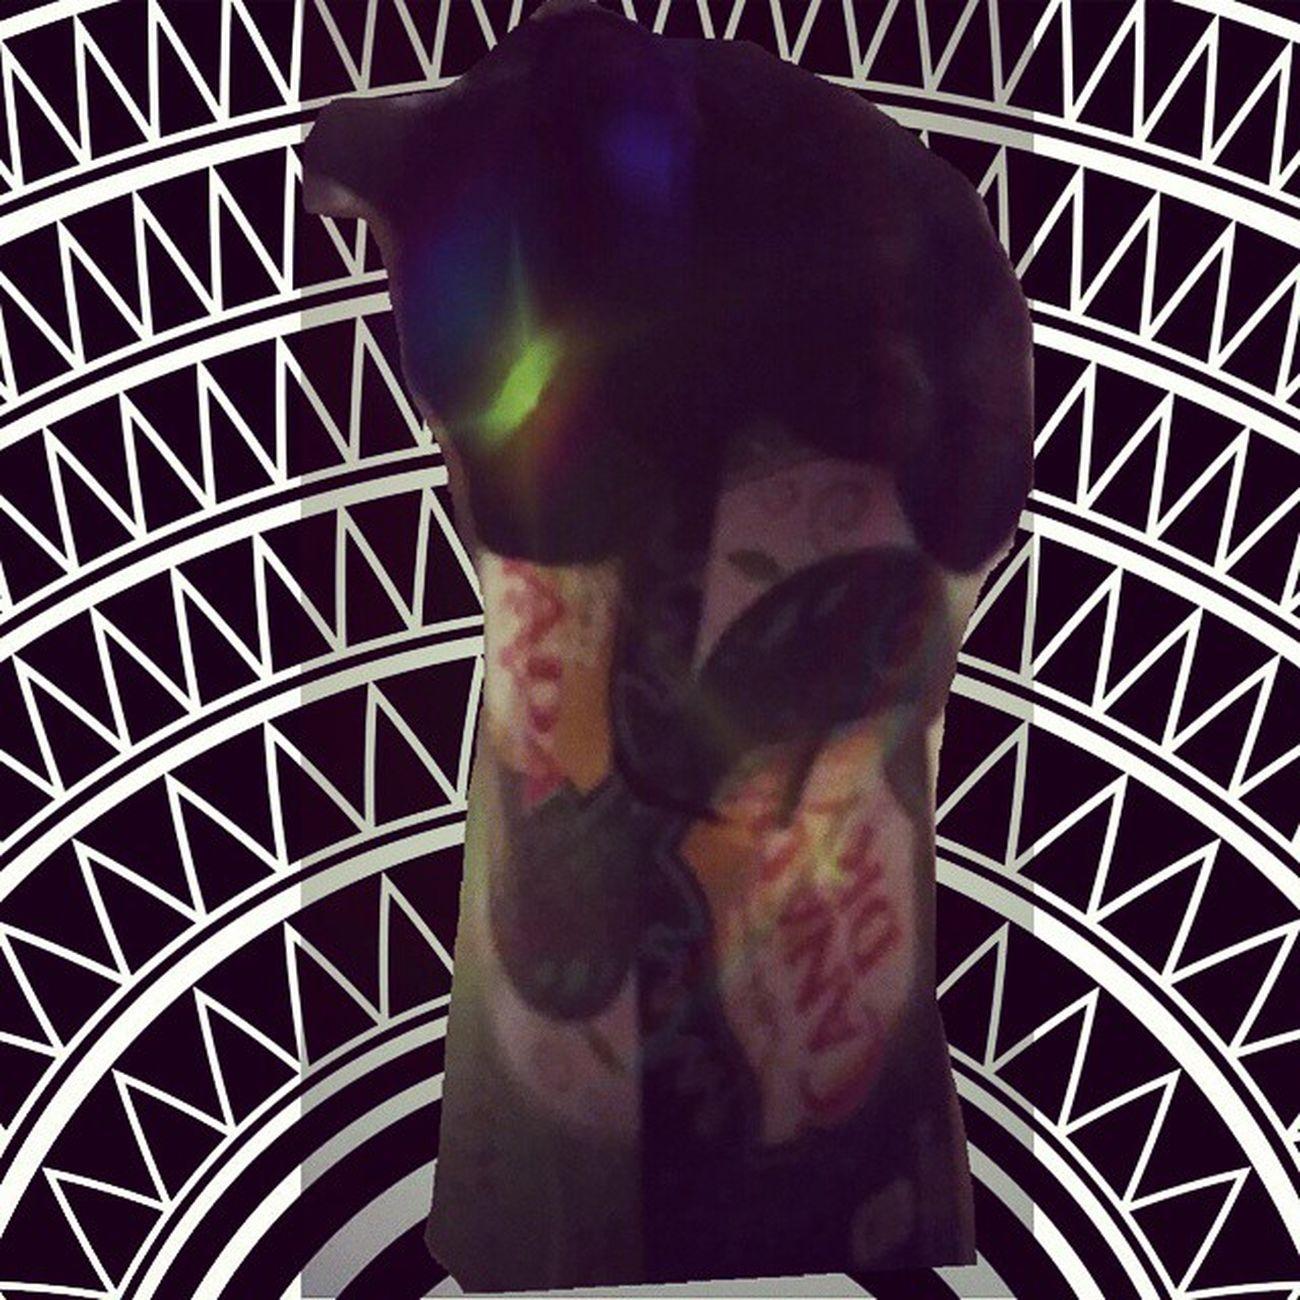 Bagherrah in deep meditation in his box ??? Zencats Catsofinstagram Cats Fiercefelines blackcats familiar babyboy catscatscats bagheerah gypsycats lazycatdaze instacats furbaby instagood mysticcats